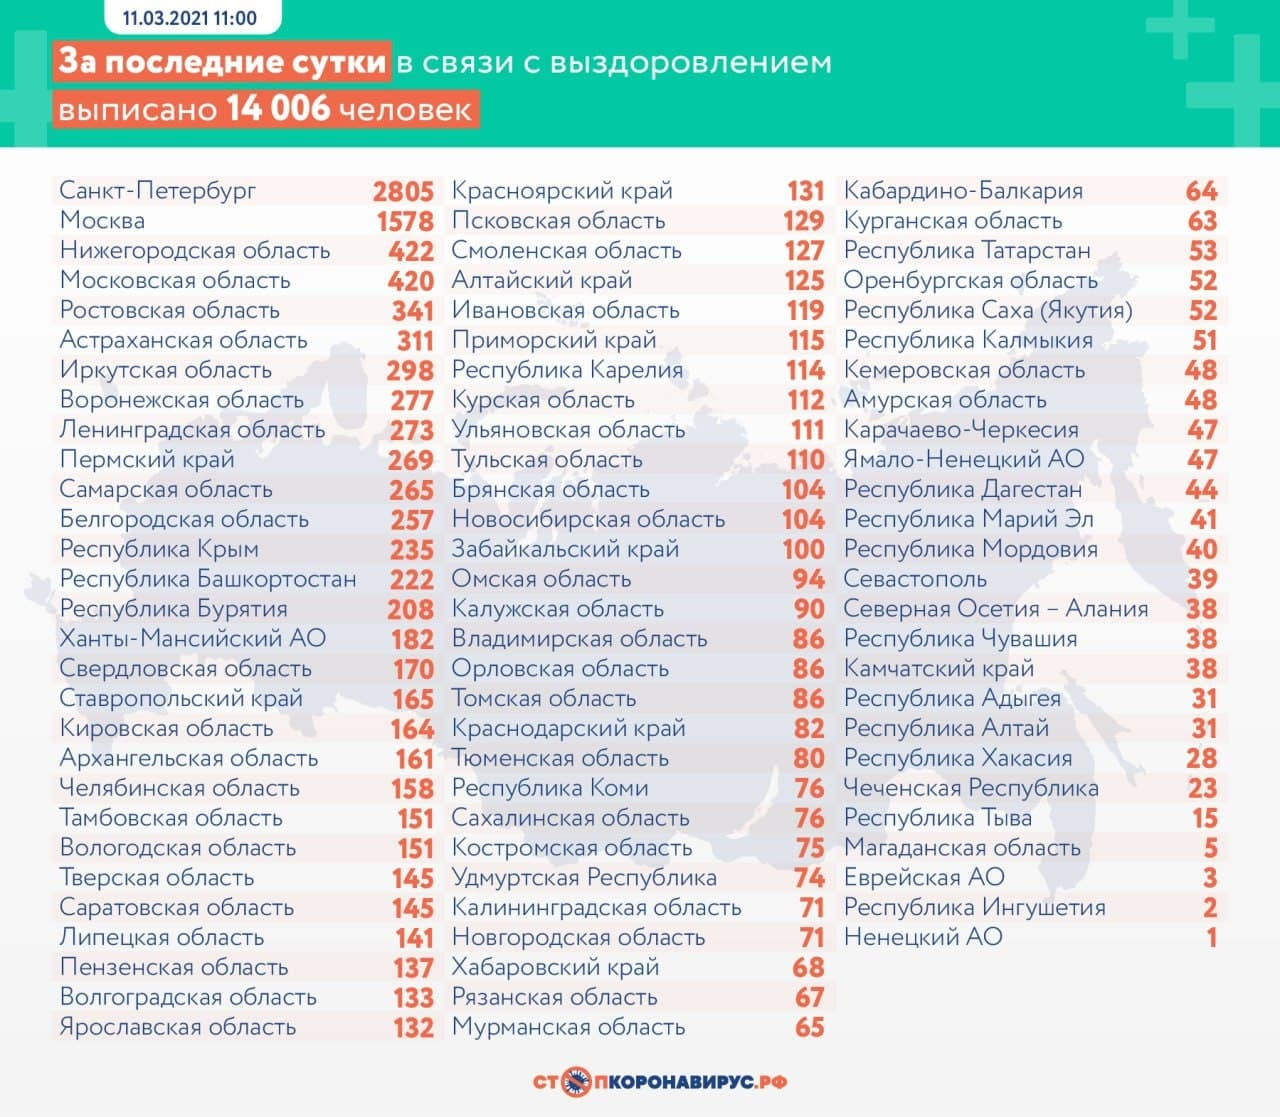 Статистика по выздоровевшим. Фото © стопкоронавирус.рф